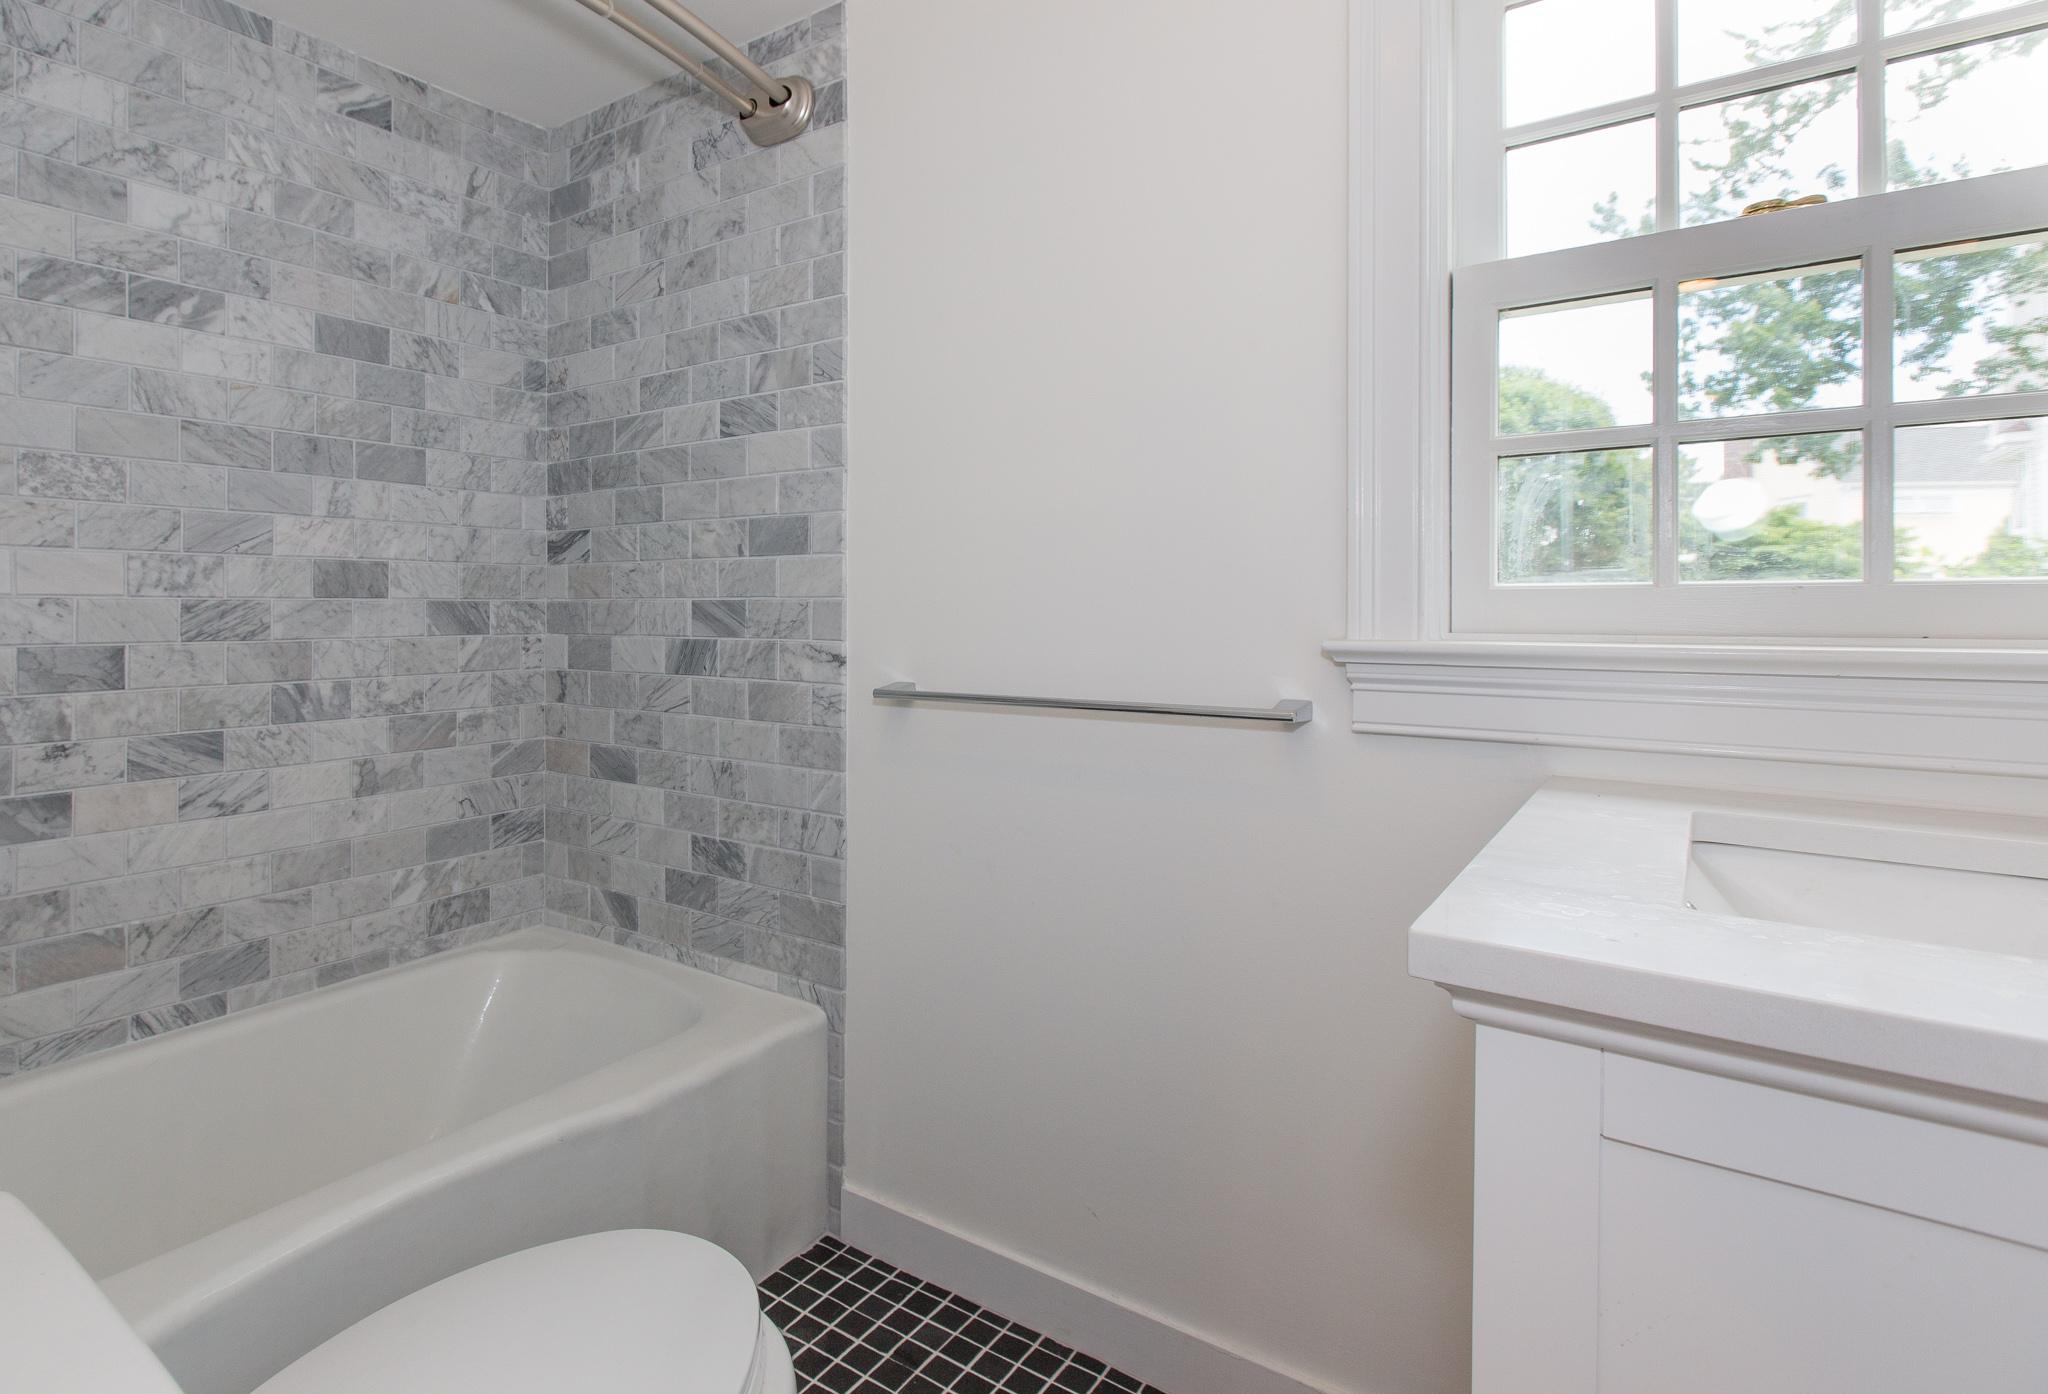 14 bath rm .jpg